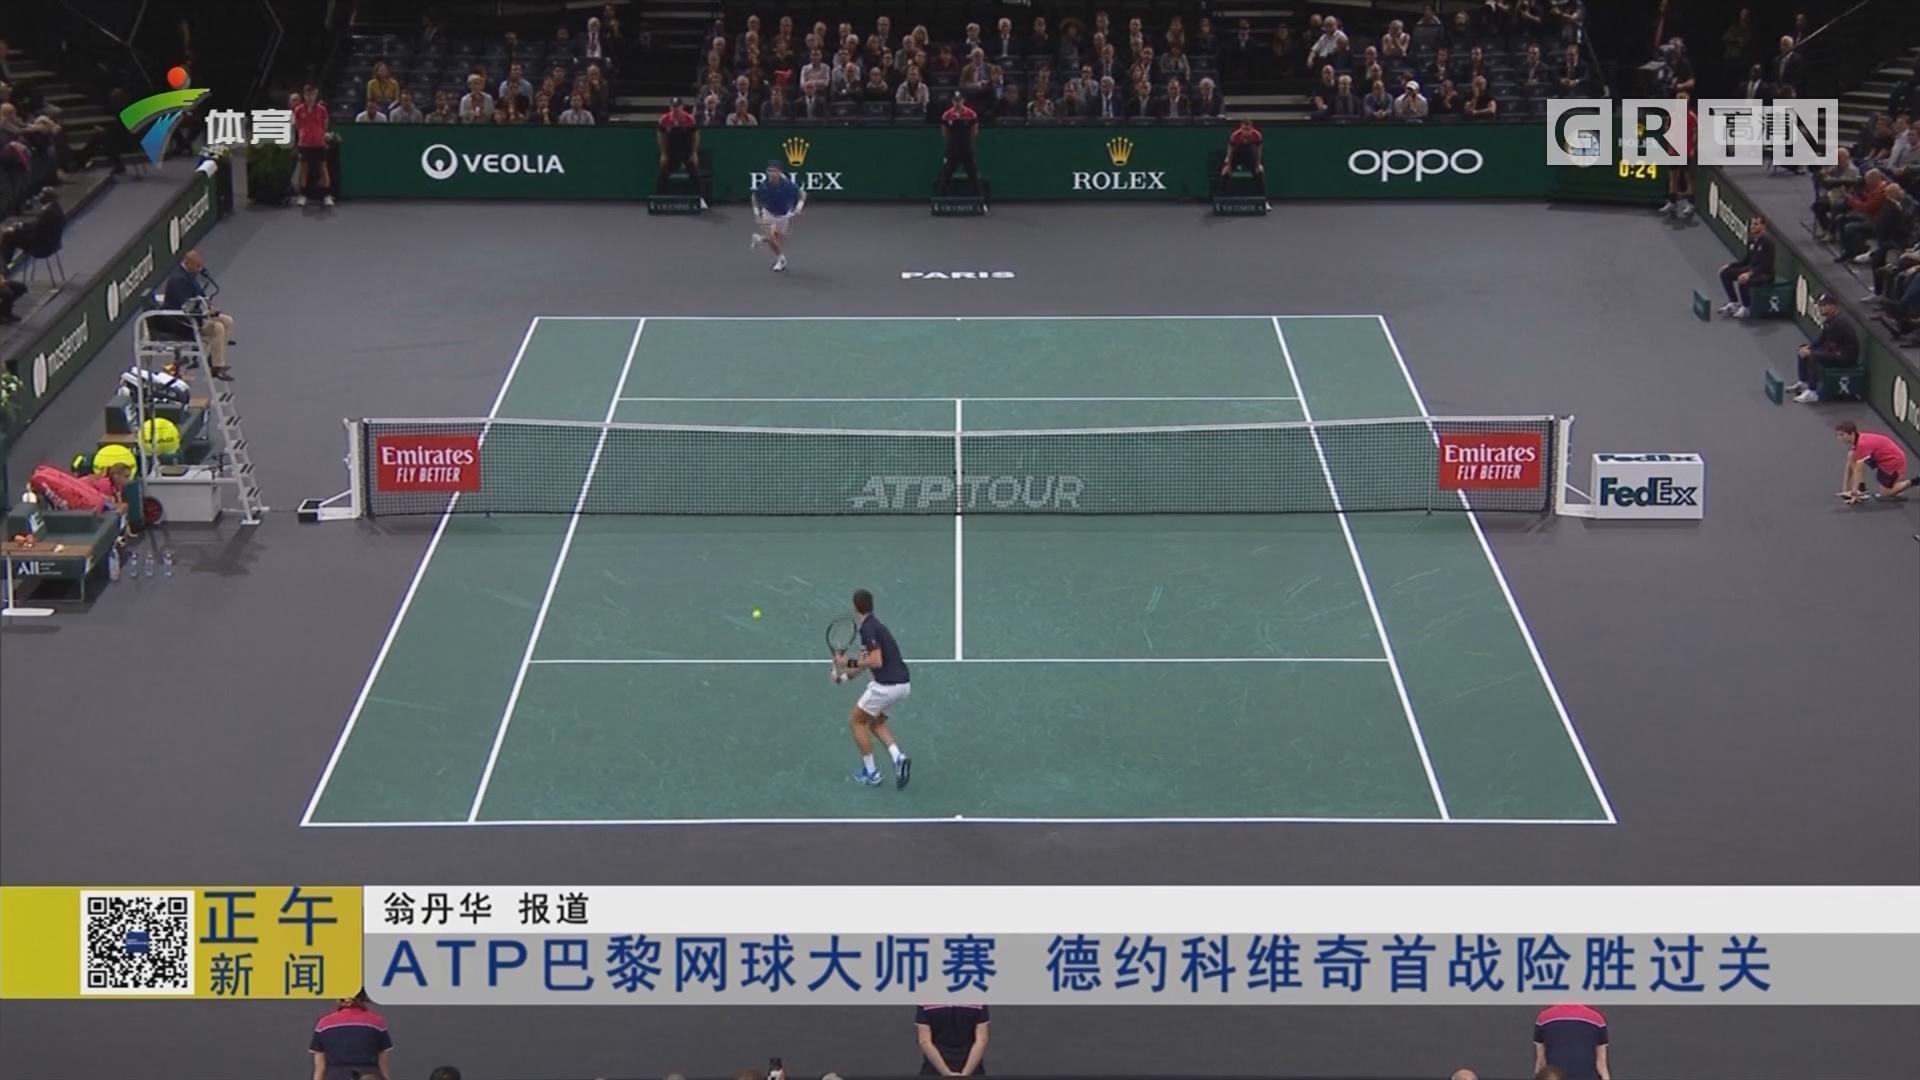 ATP巴黎网球大师赛 德约科维奇首战险胜过关